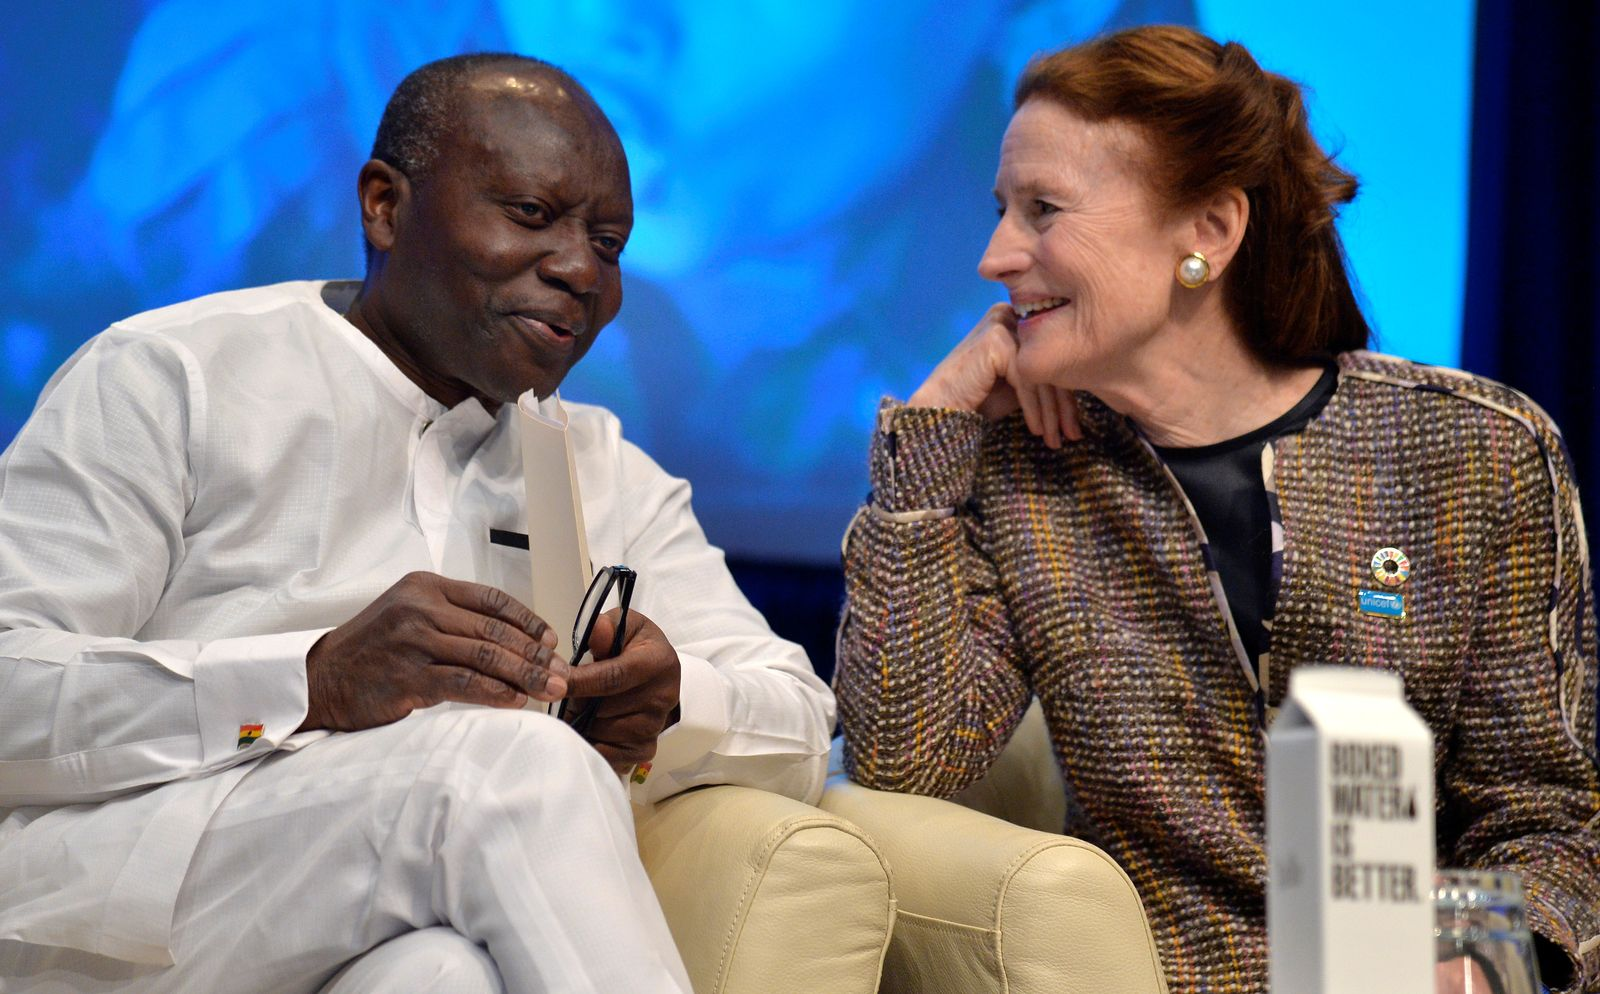 Ghana Finanzminister Kenneth Ofori-Atta